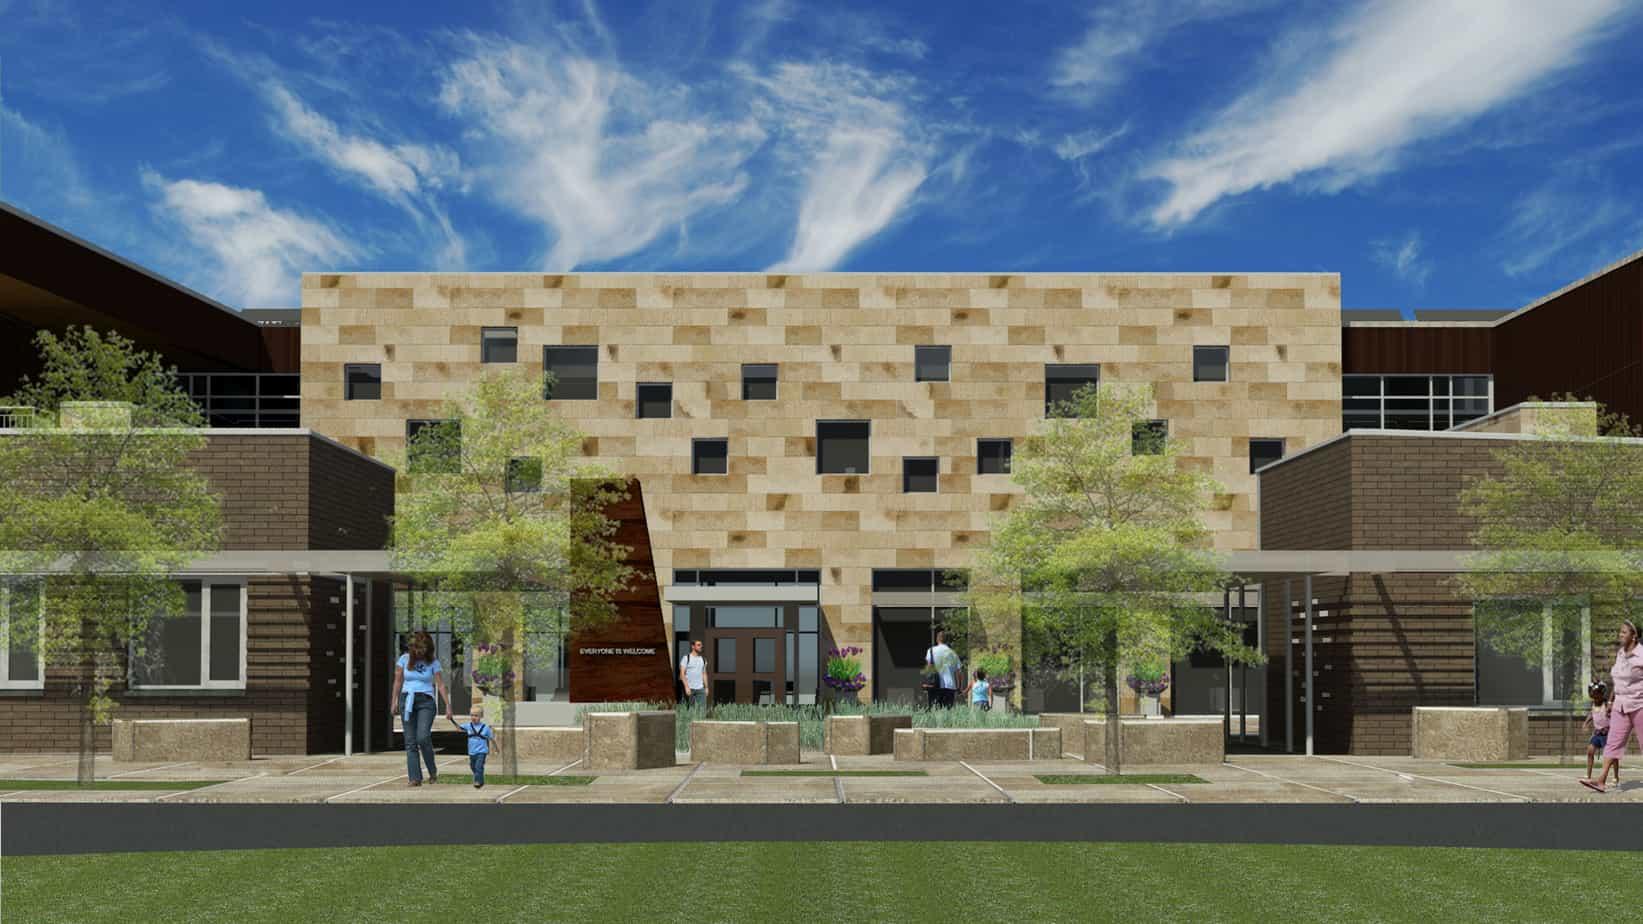 Boulder JCC South Entrance